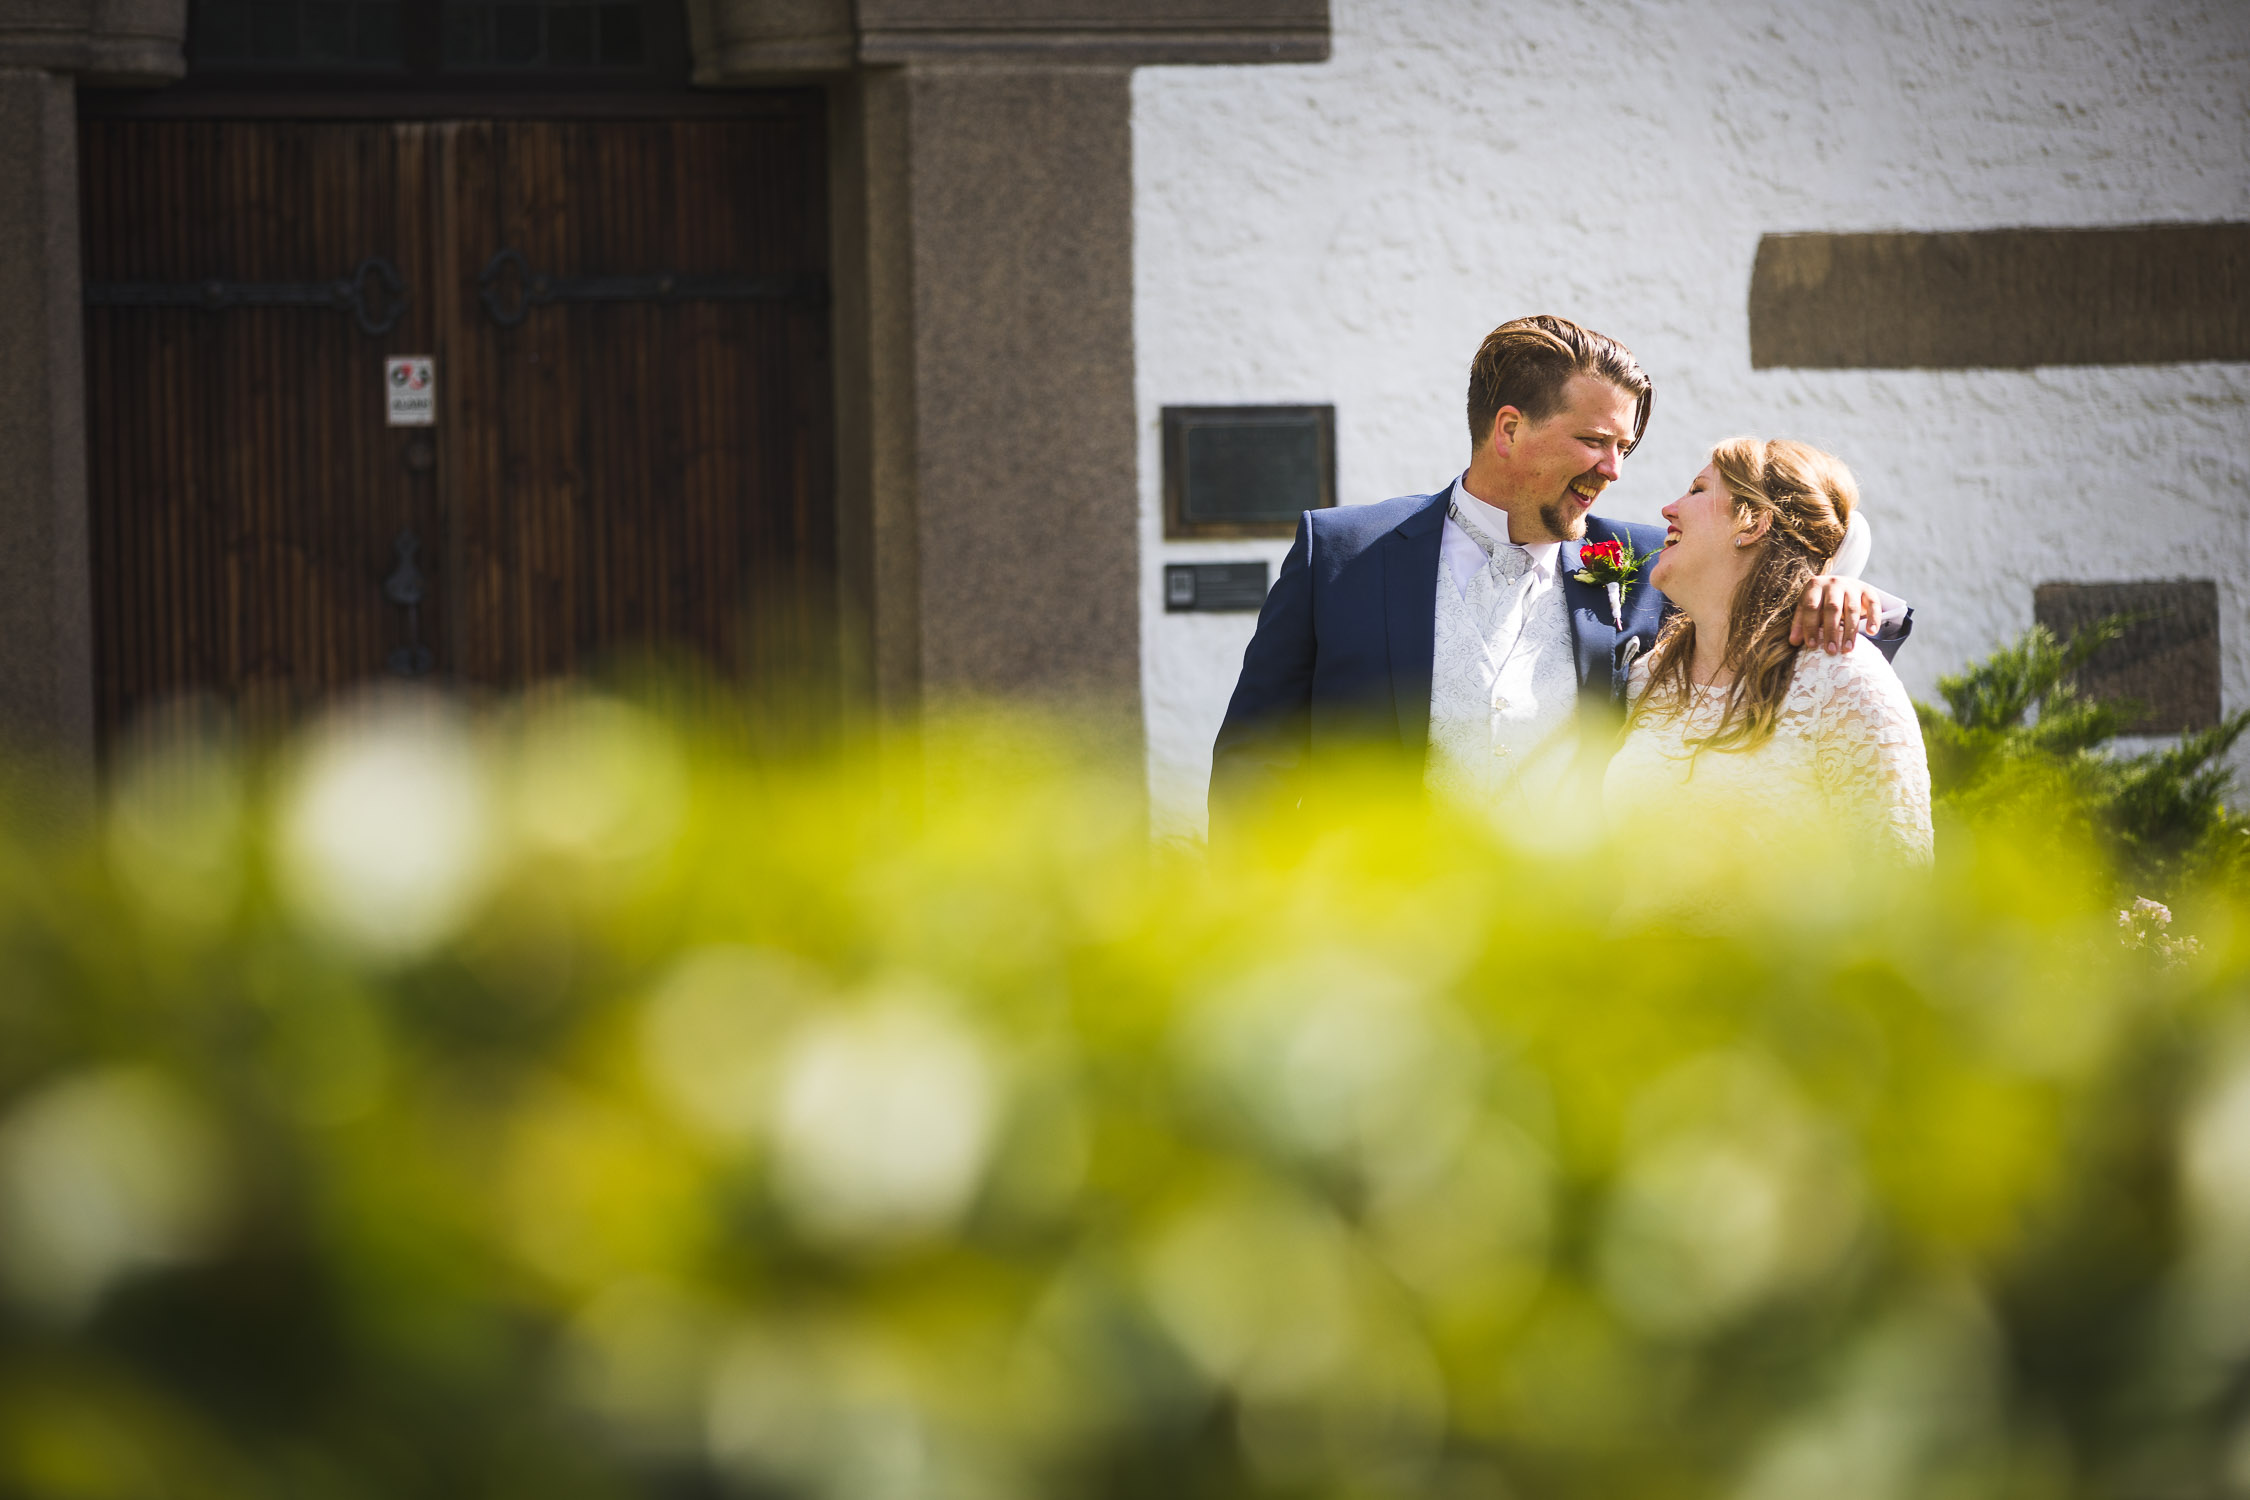 bryllup-bryllupsfotografering-bryllupsfotograf-sarpsborg-20170819-_H2A3725bryllup.jpg